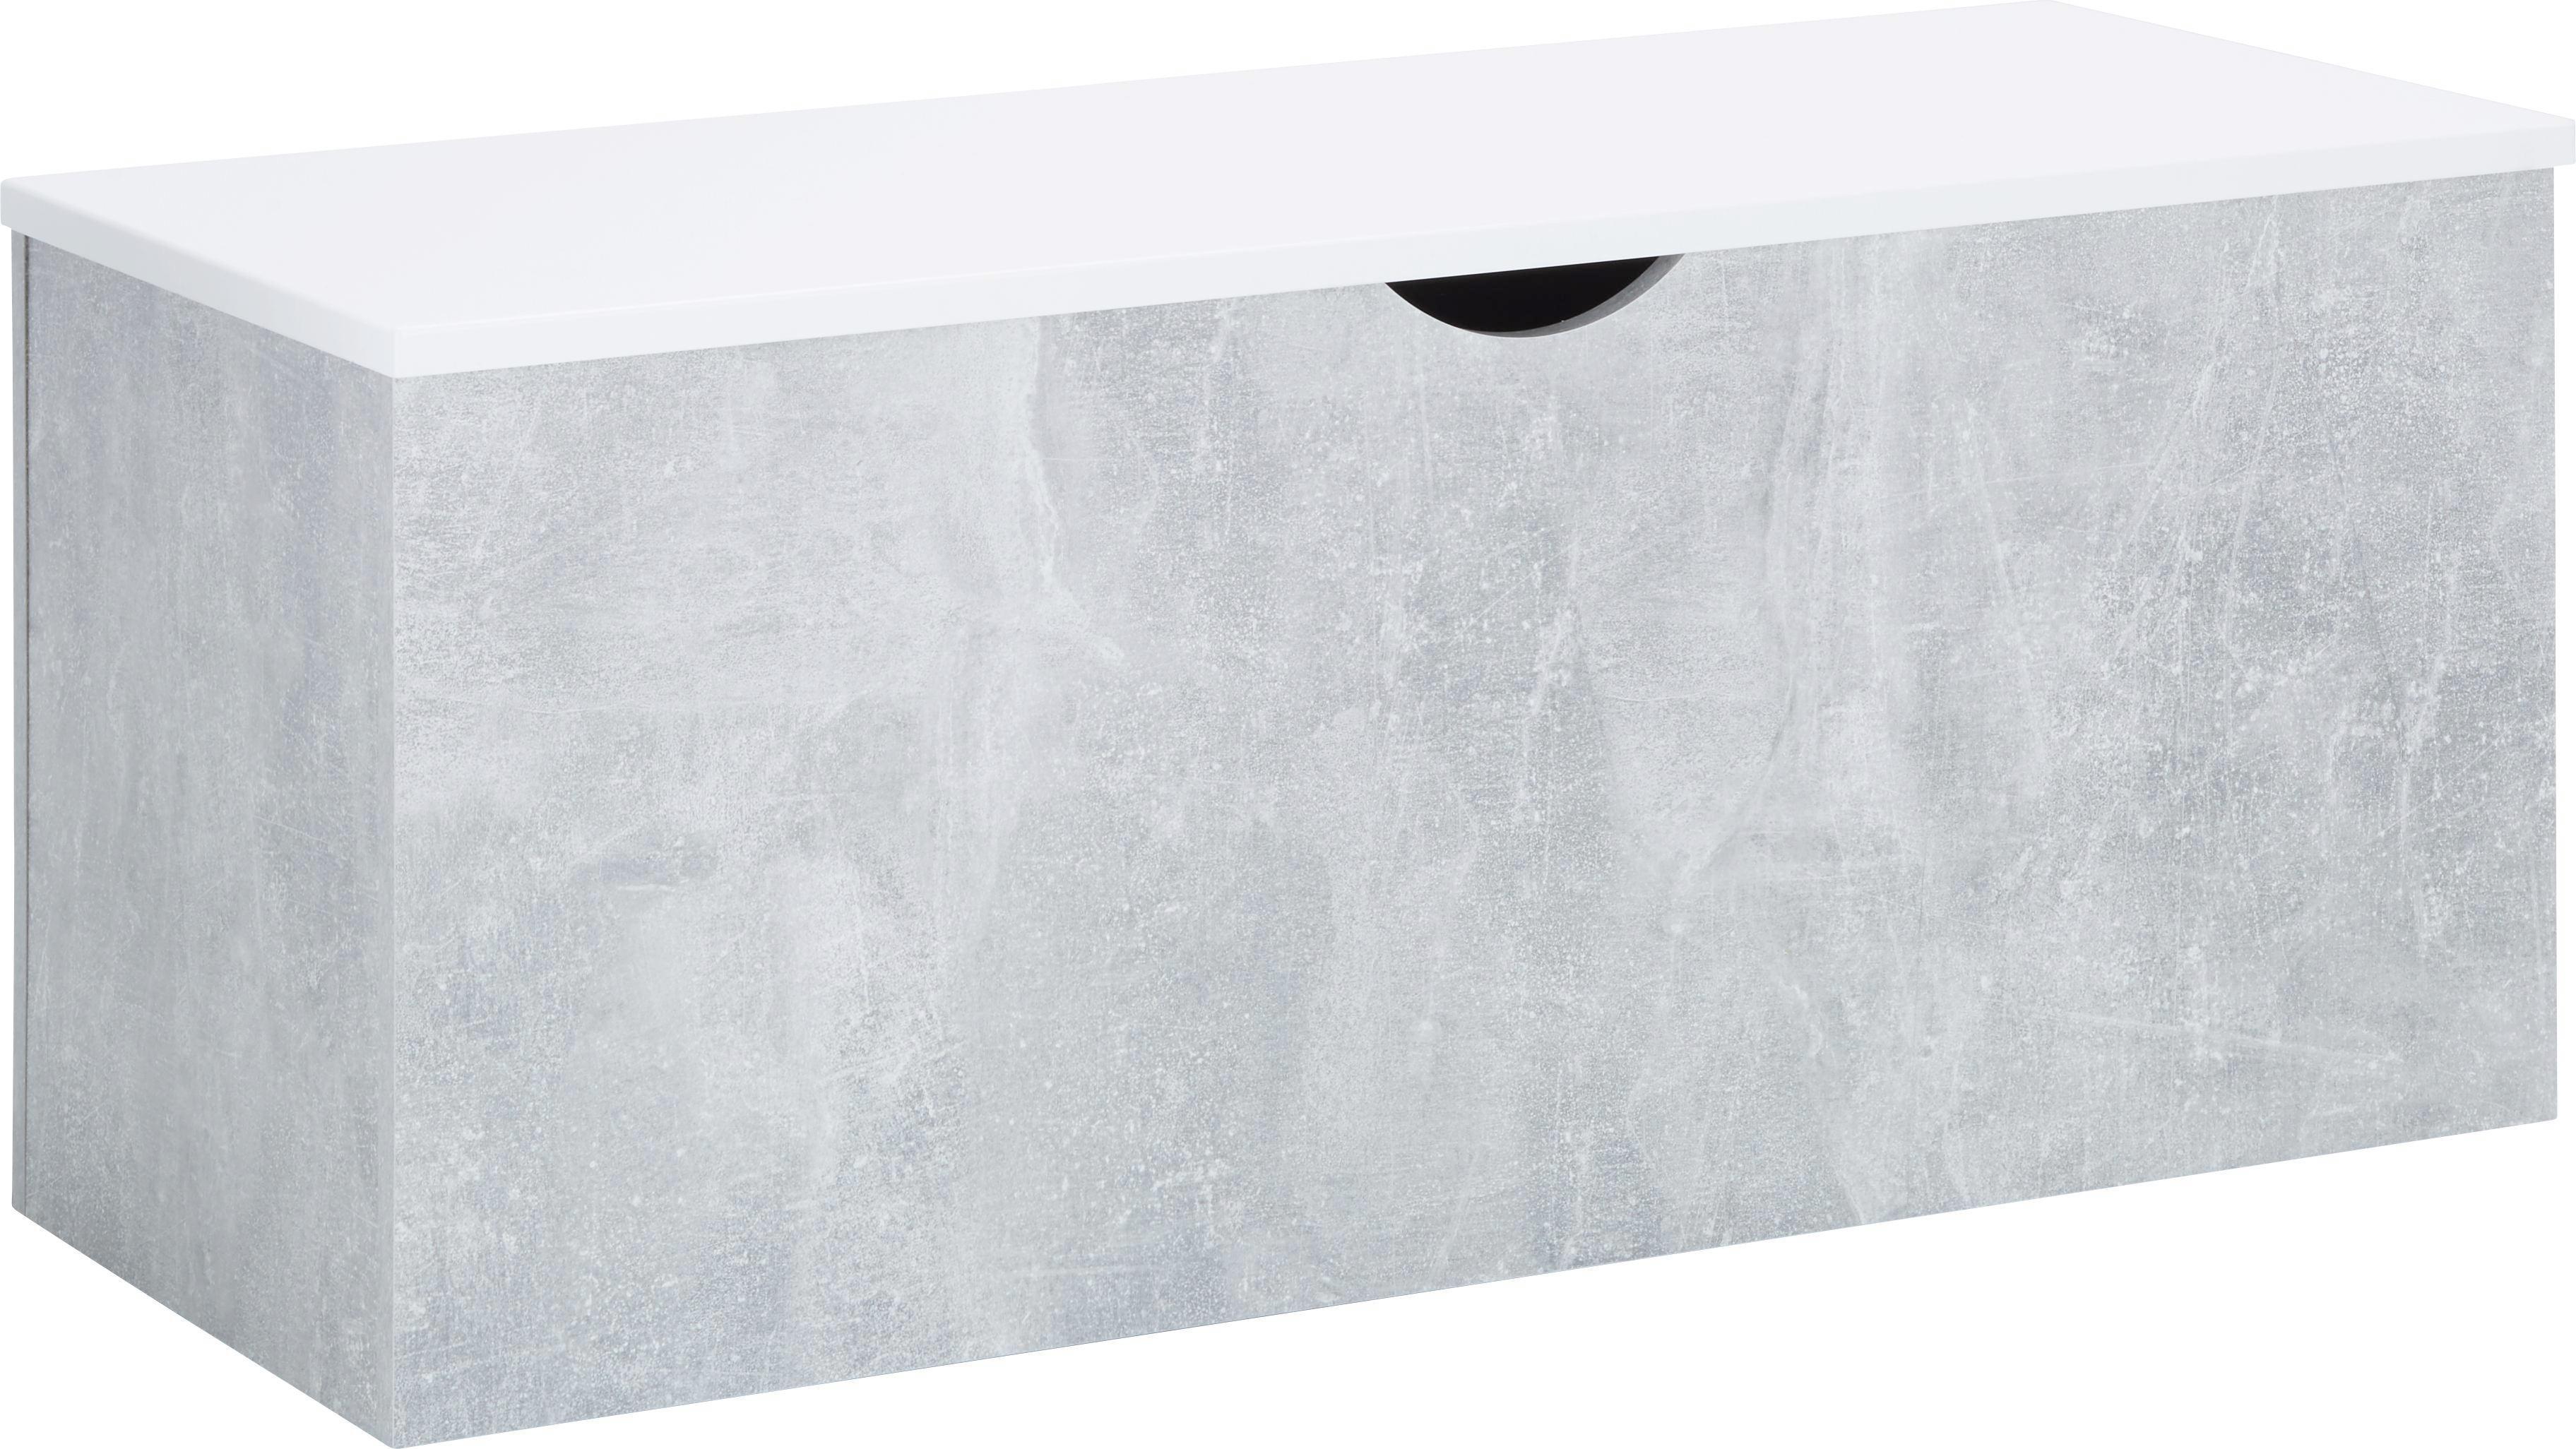 Truhe Alberto - Hellgrau/Weiß, Holzwerkstoff (100/44/43cm) - MÖMAX modern living